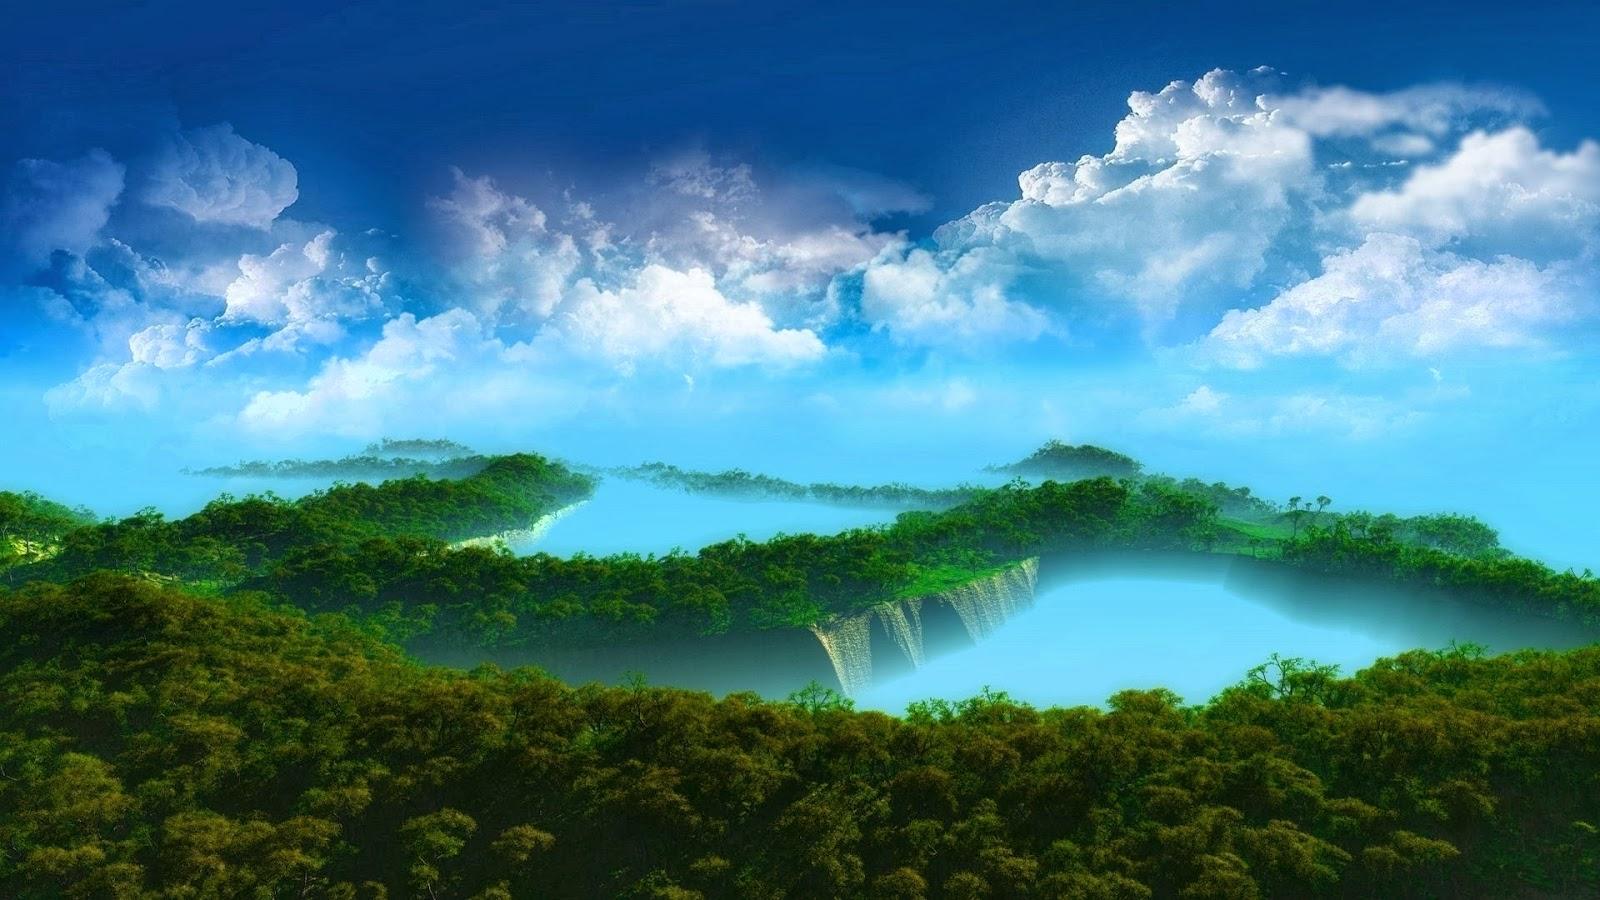 3D landscape wallpapers - Mobile wallpapers